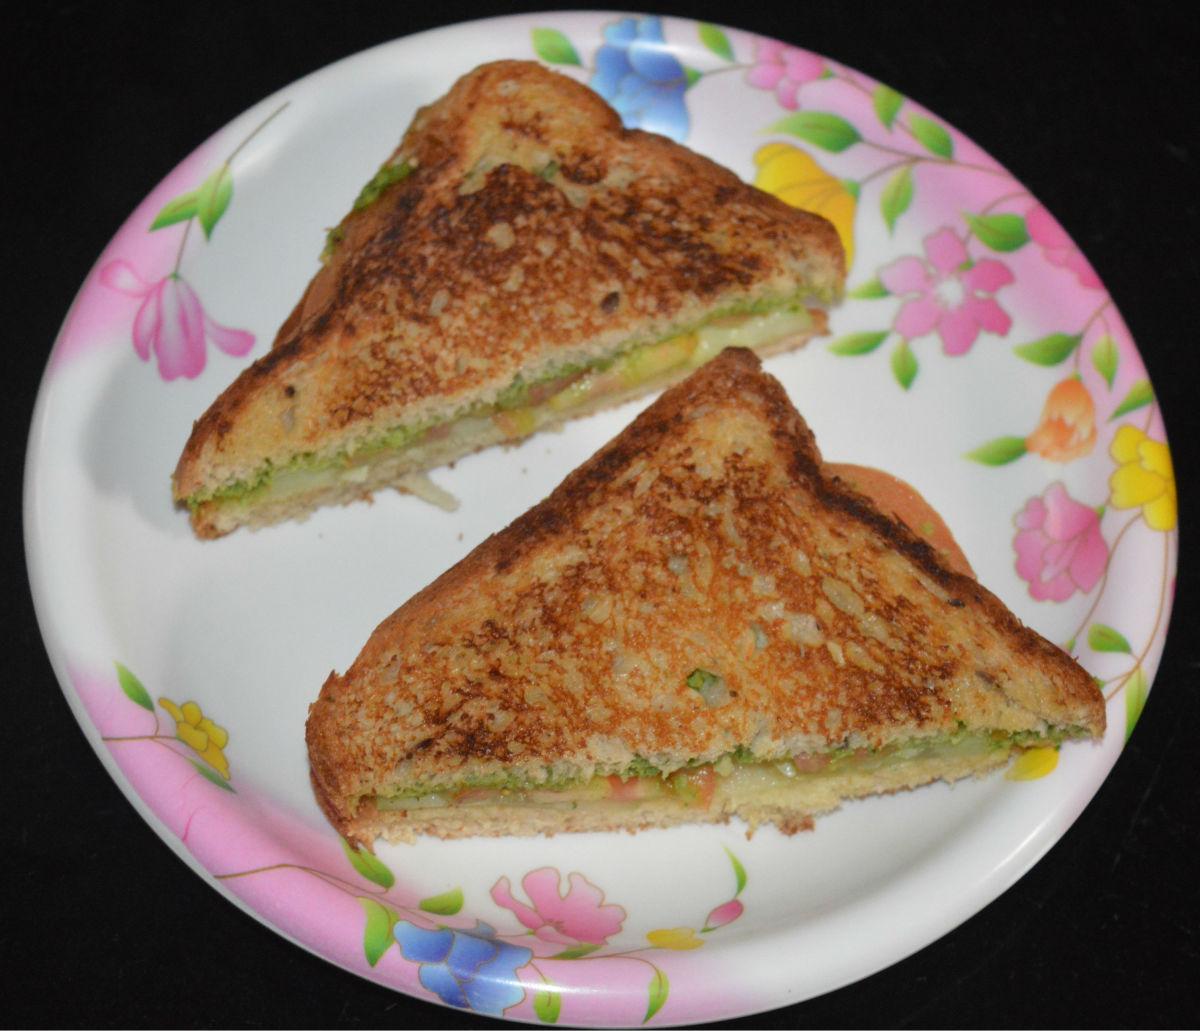 How to Make a Green Coriander Chutney Sandwich